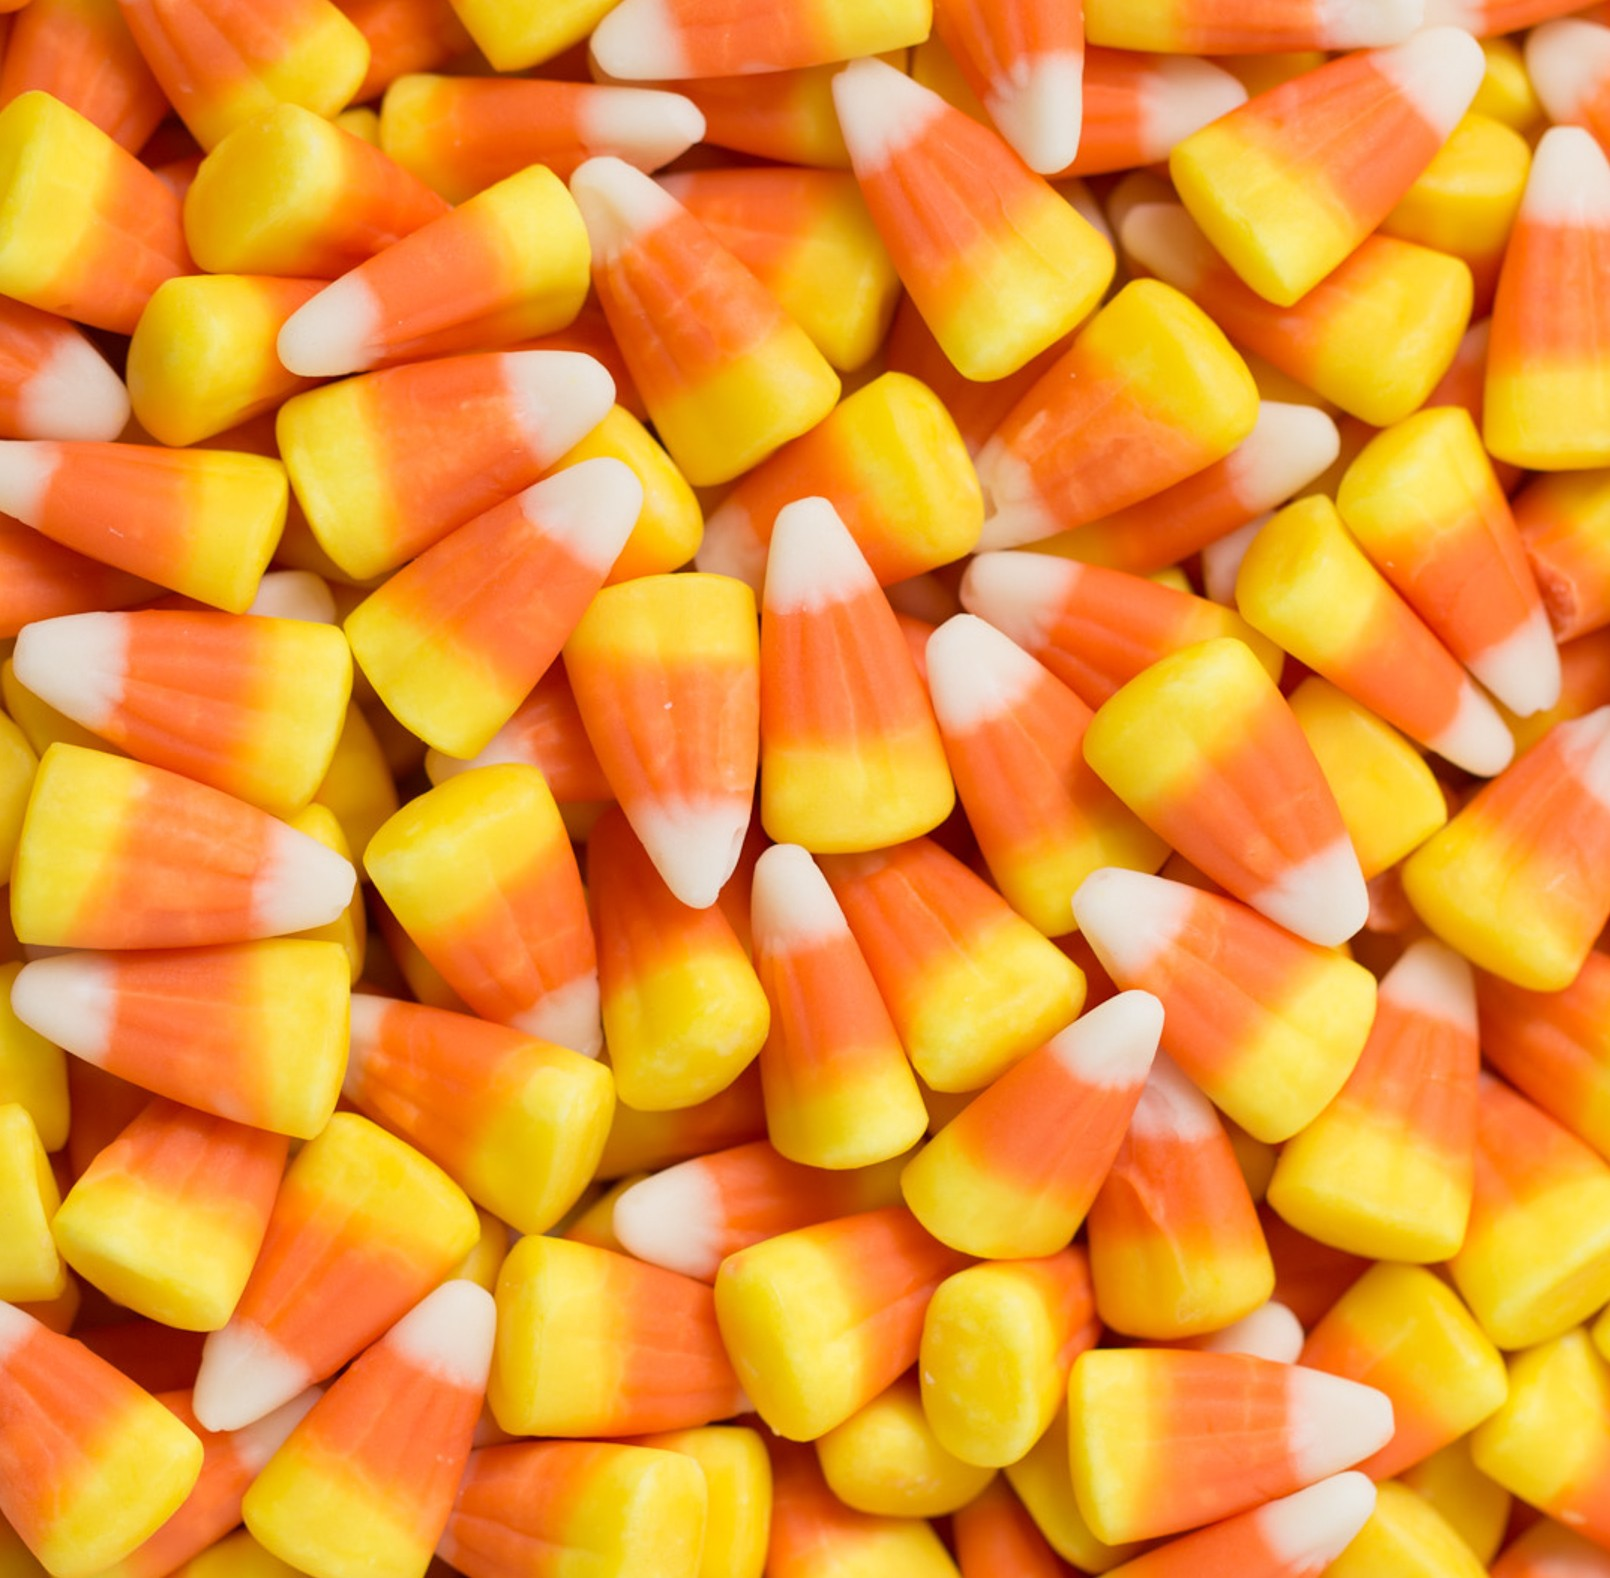 Fall Sunrise Wallpaper Bulk Candy Corn Sweet City Candy